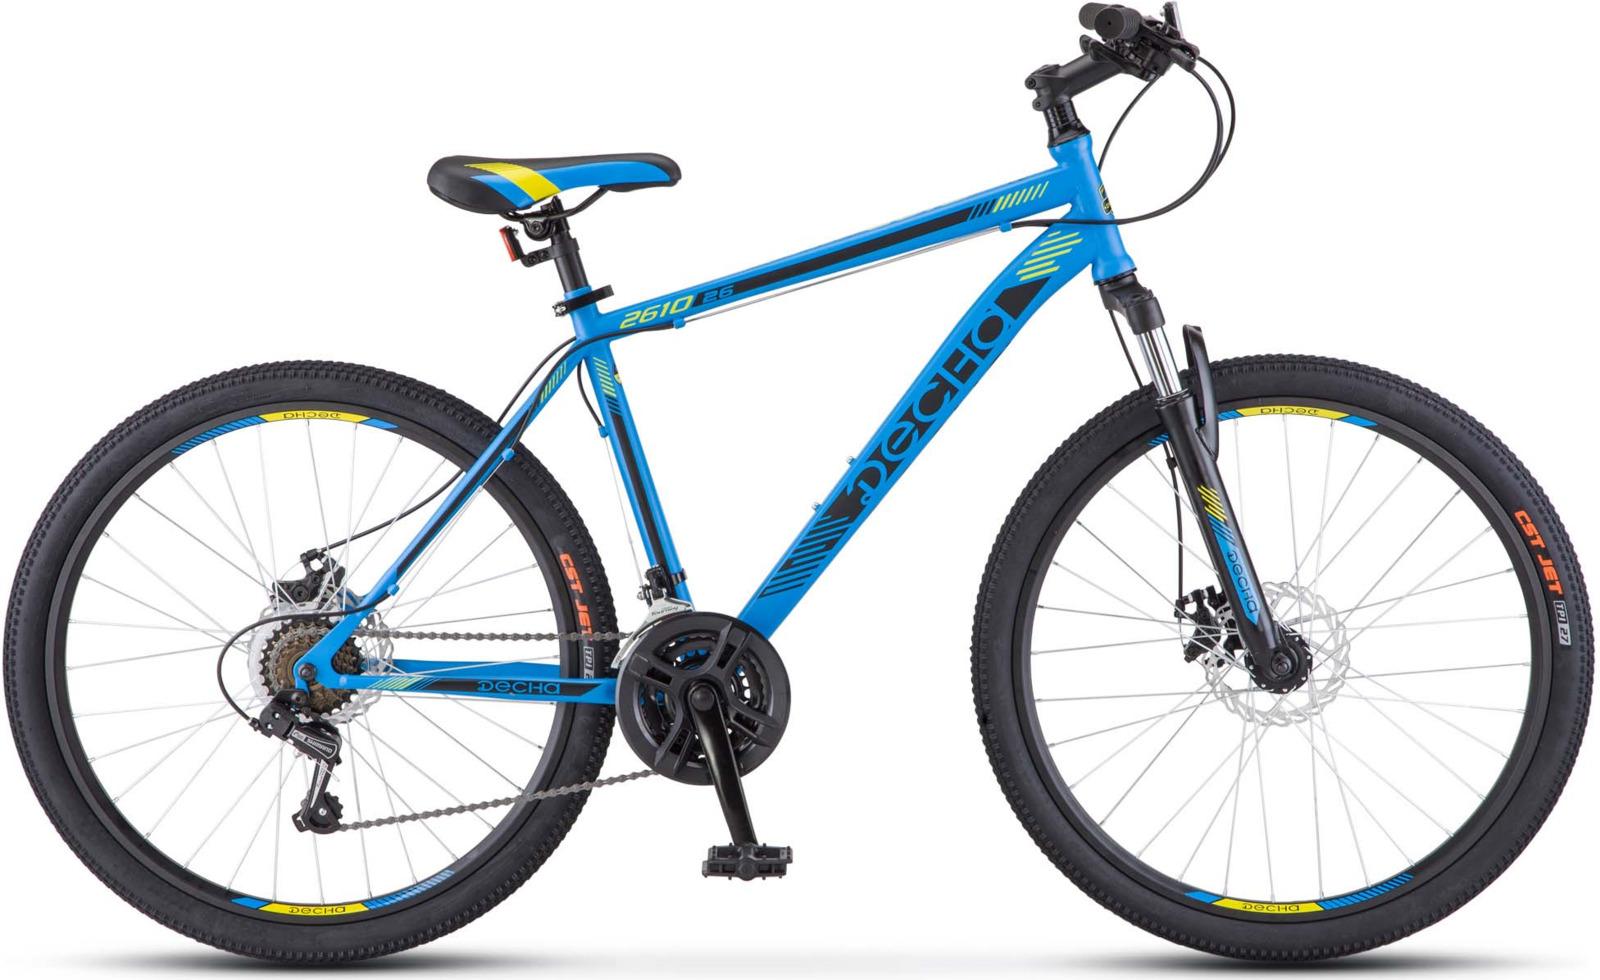 Велосипед Stels Десна-2610 MD 26, KUBC0045562017, синий цена